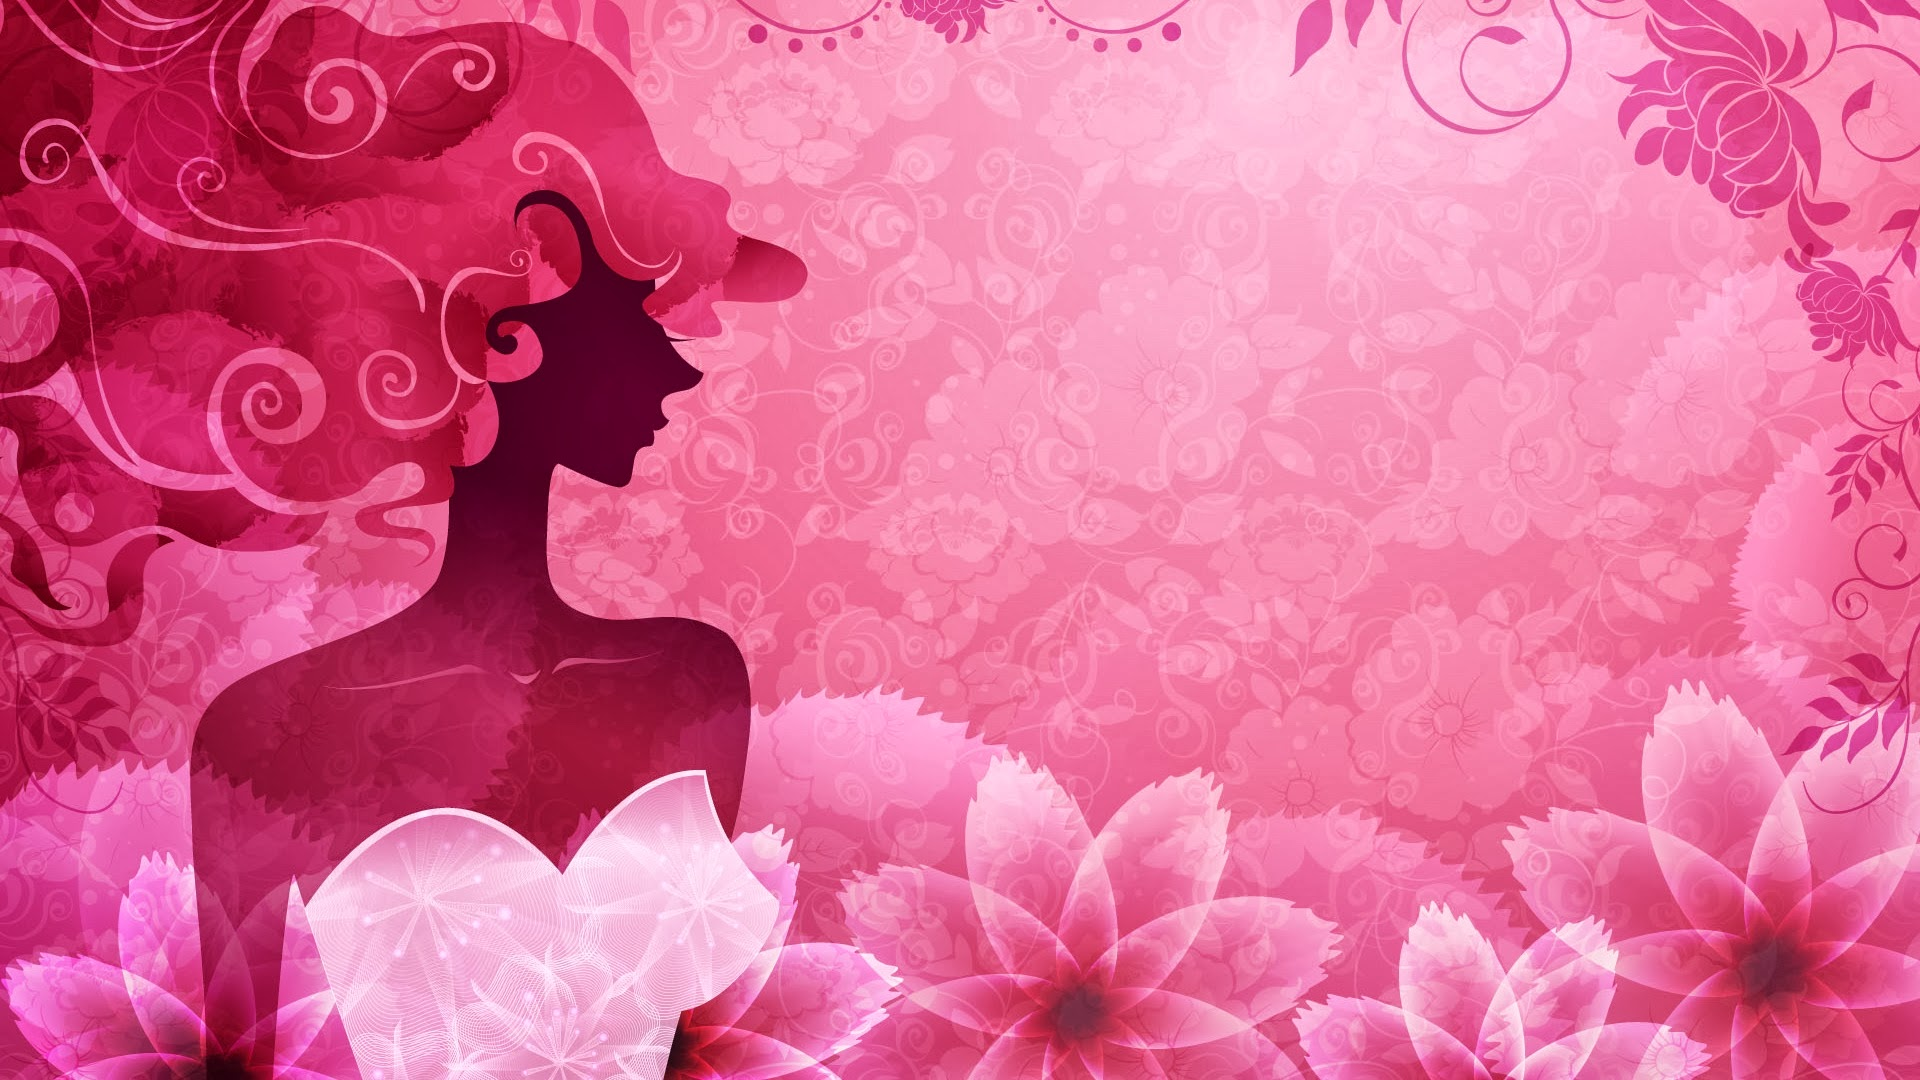 Rosa Pastel Fondos De Pantalla Rosa Pastel Fotos Gratis